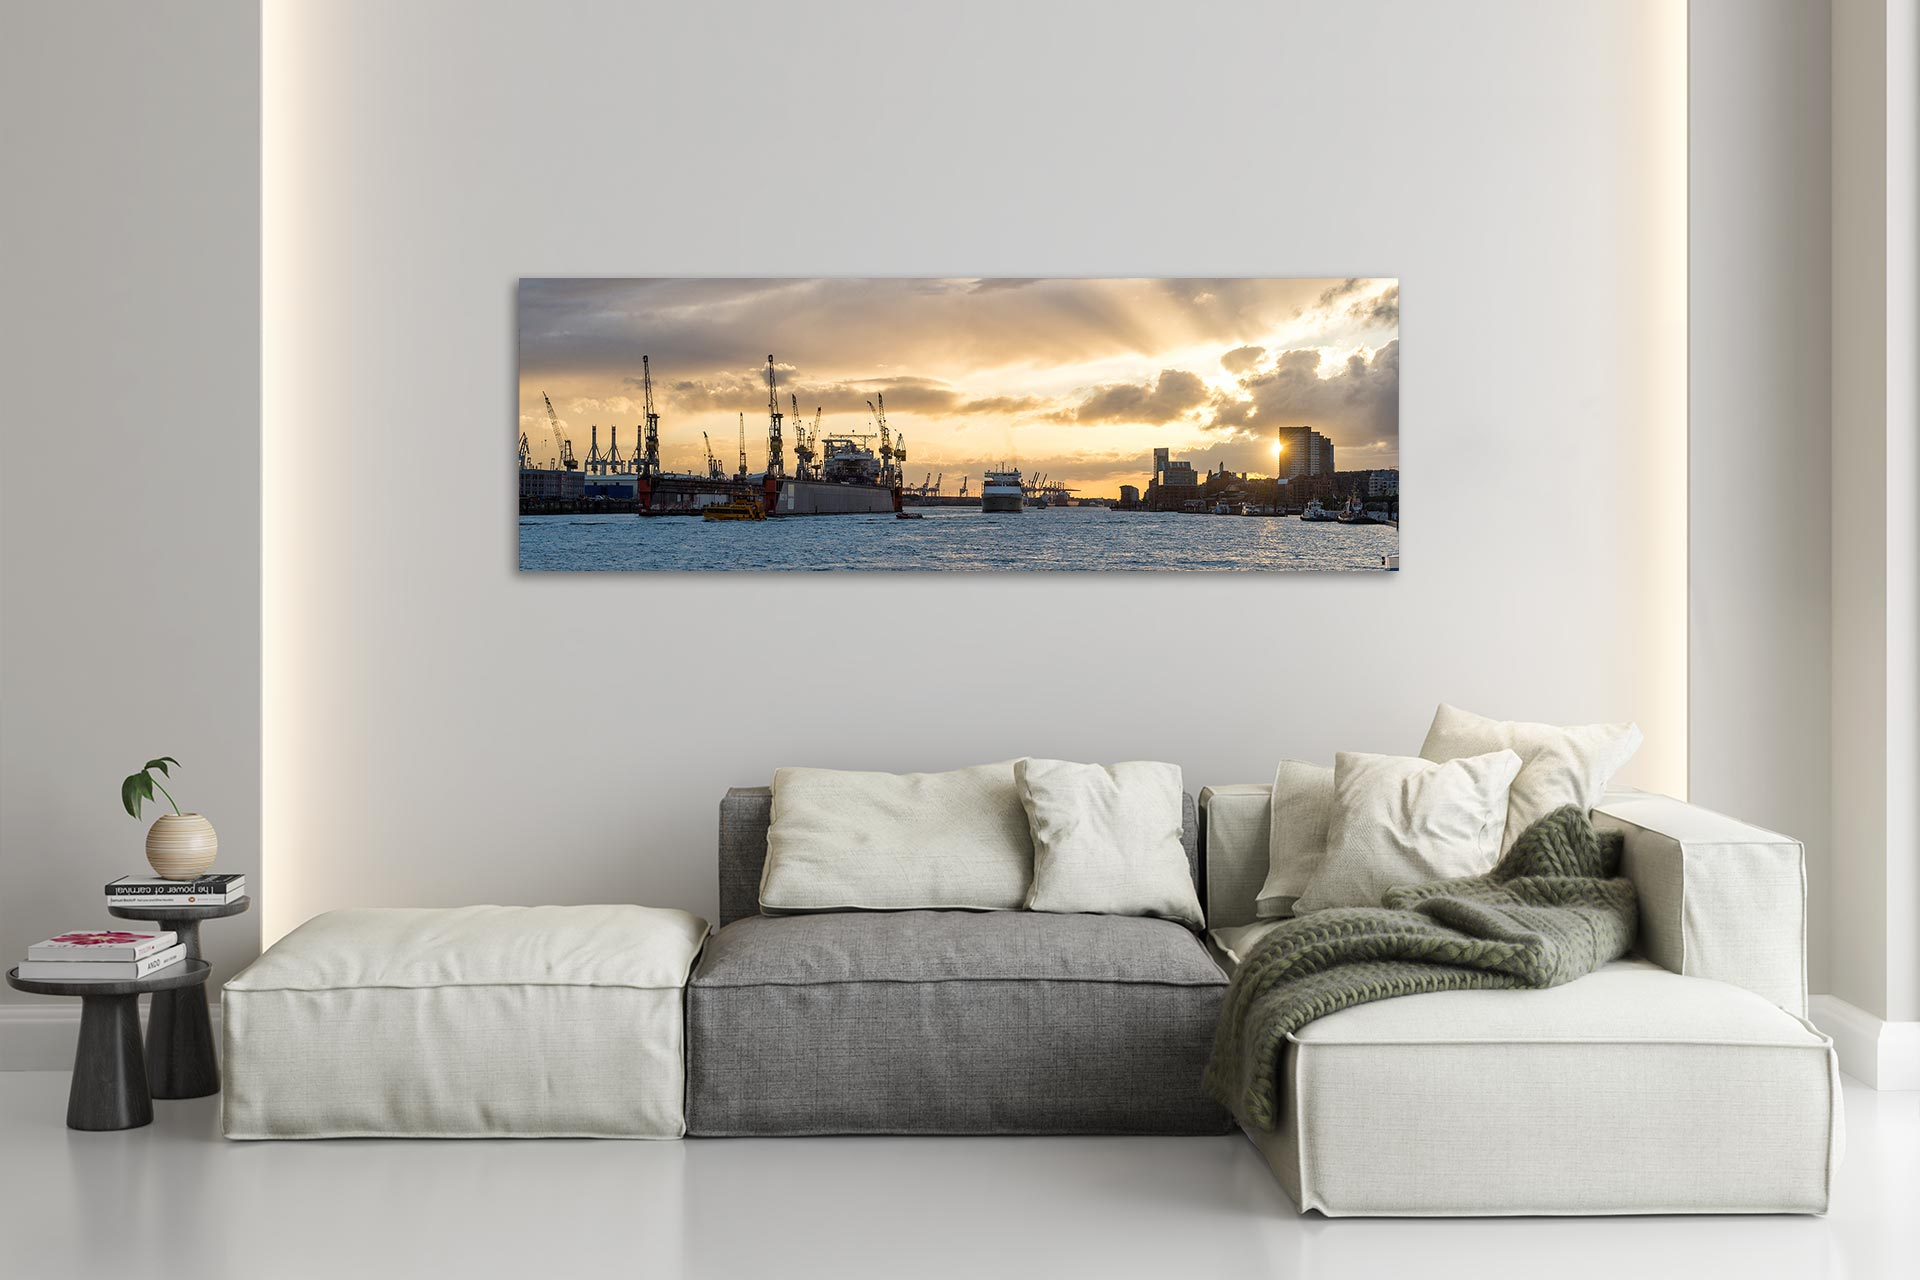 PSW045-panorama-hamburg-hafen-leinwand-acrylglas-aludibond-wohnzimmer